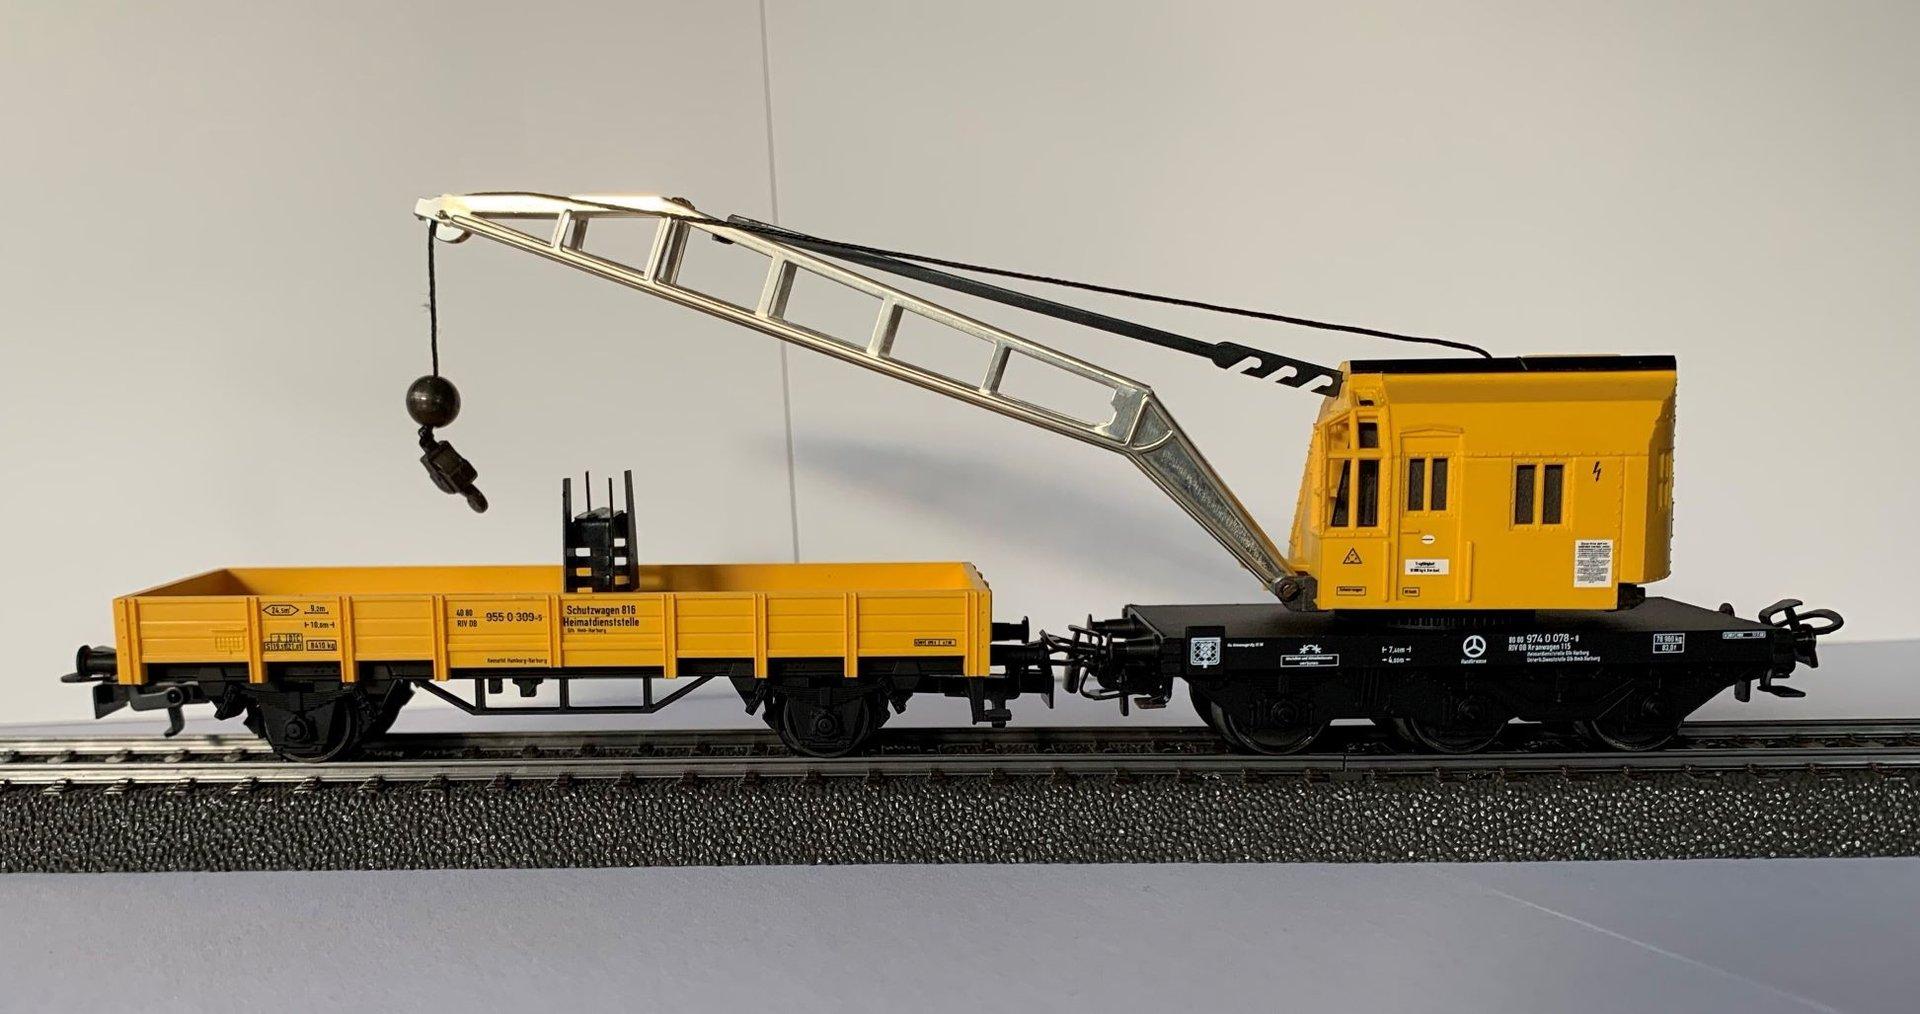 Niederbordwagen 4471 #NEU OHNE Originalverpackung# Set Märklin 4671 Kranwagen